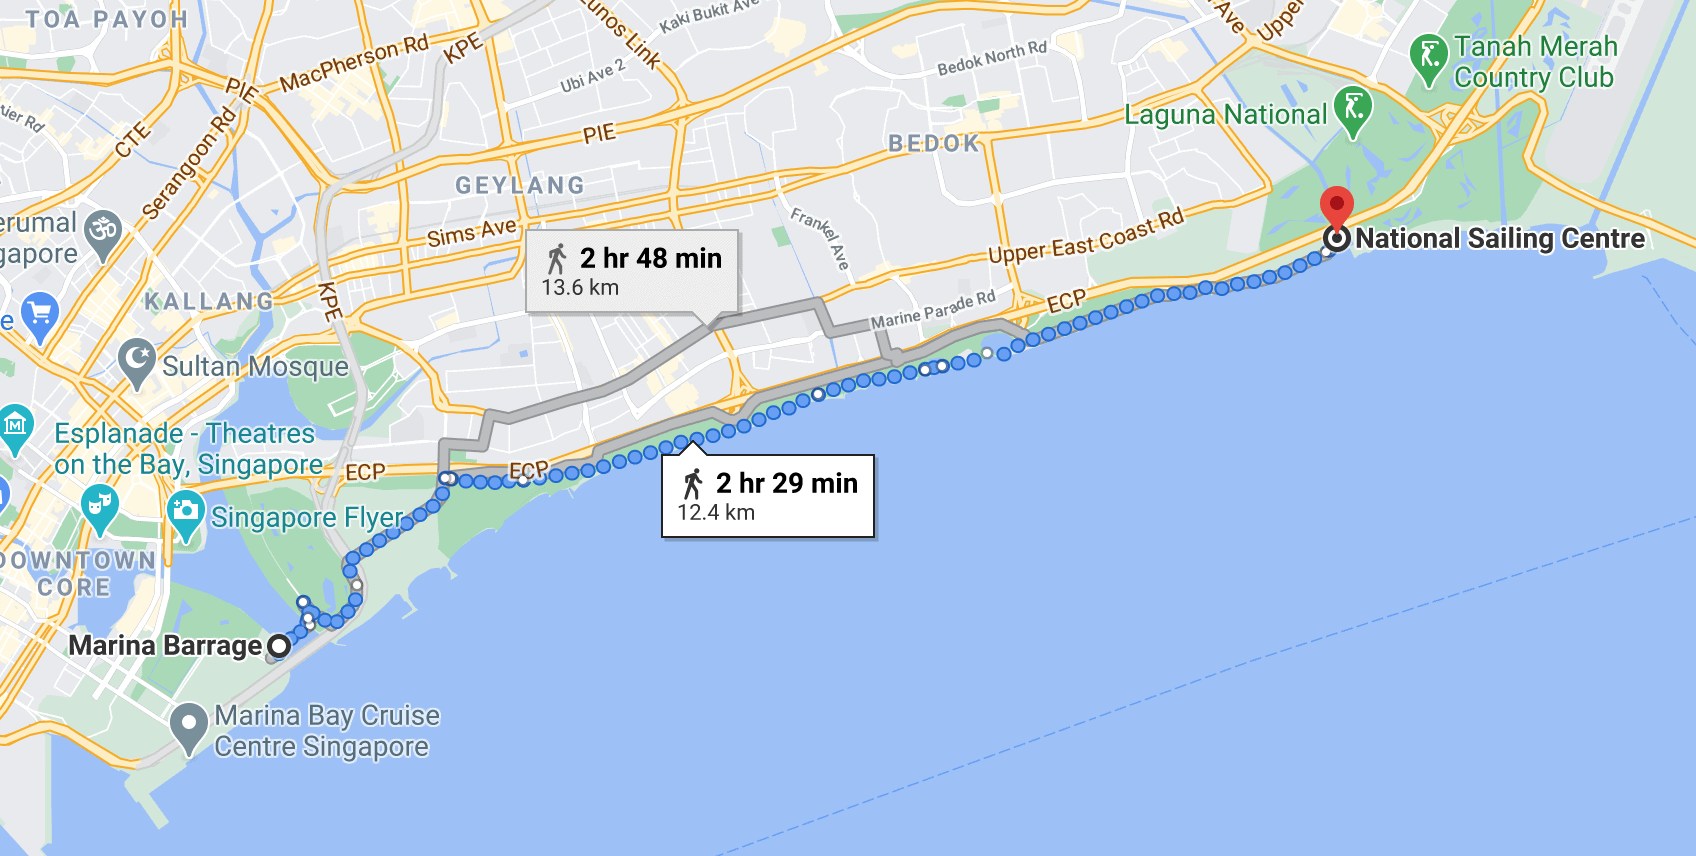 East Coast Park map